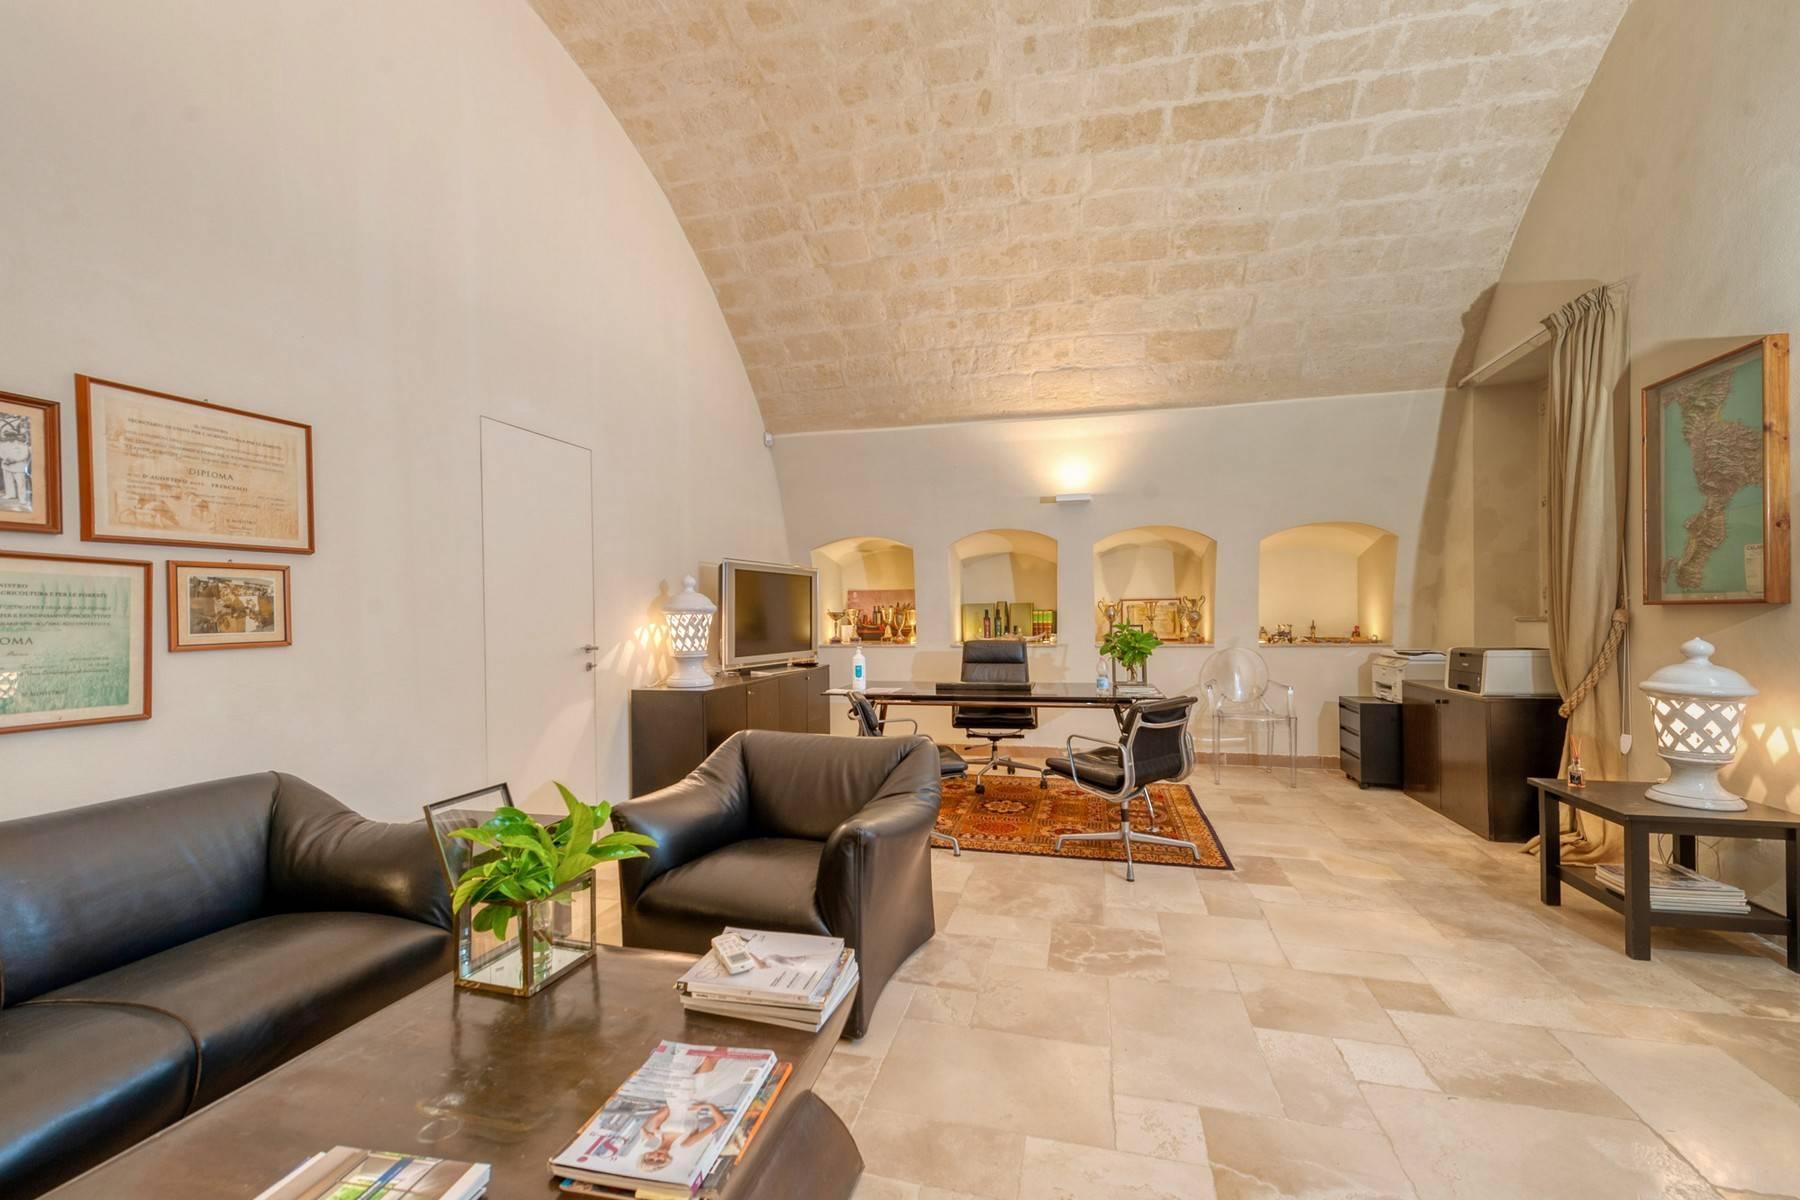 Splendida villa gentilizia del '600 circondata da agrumeti - 45